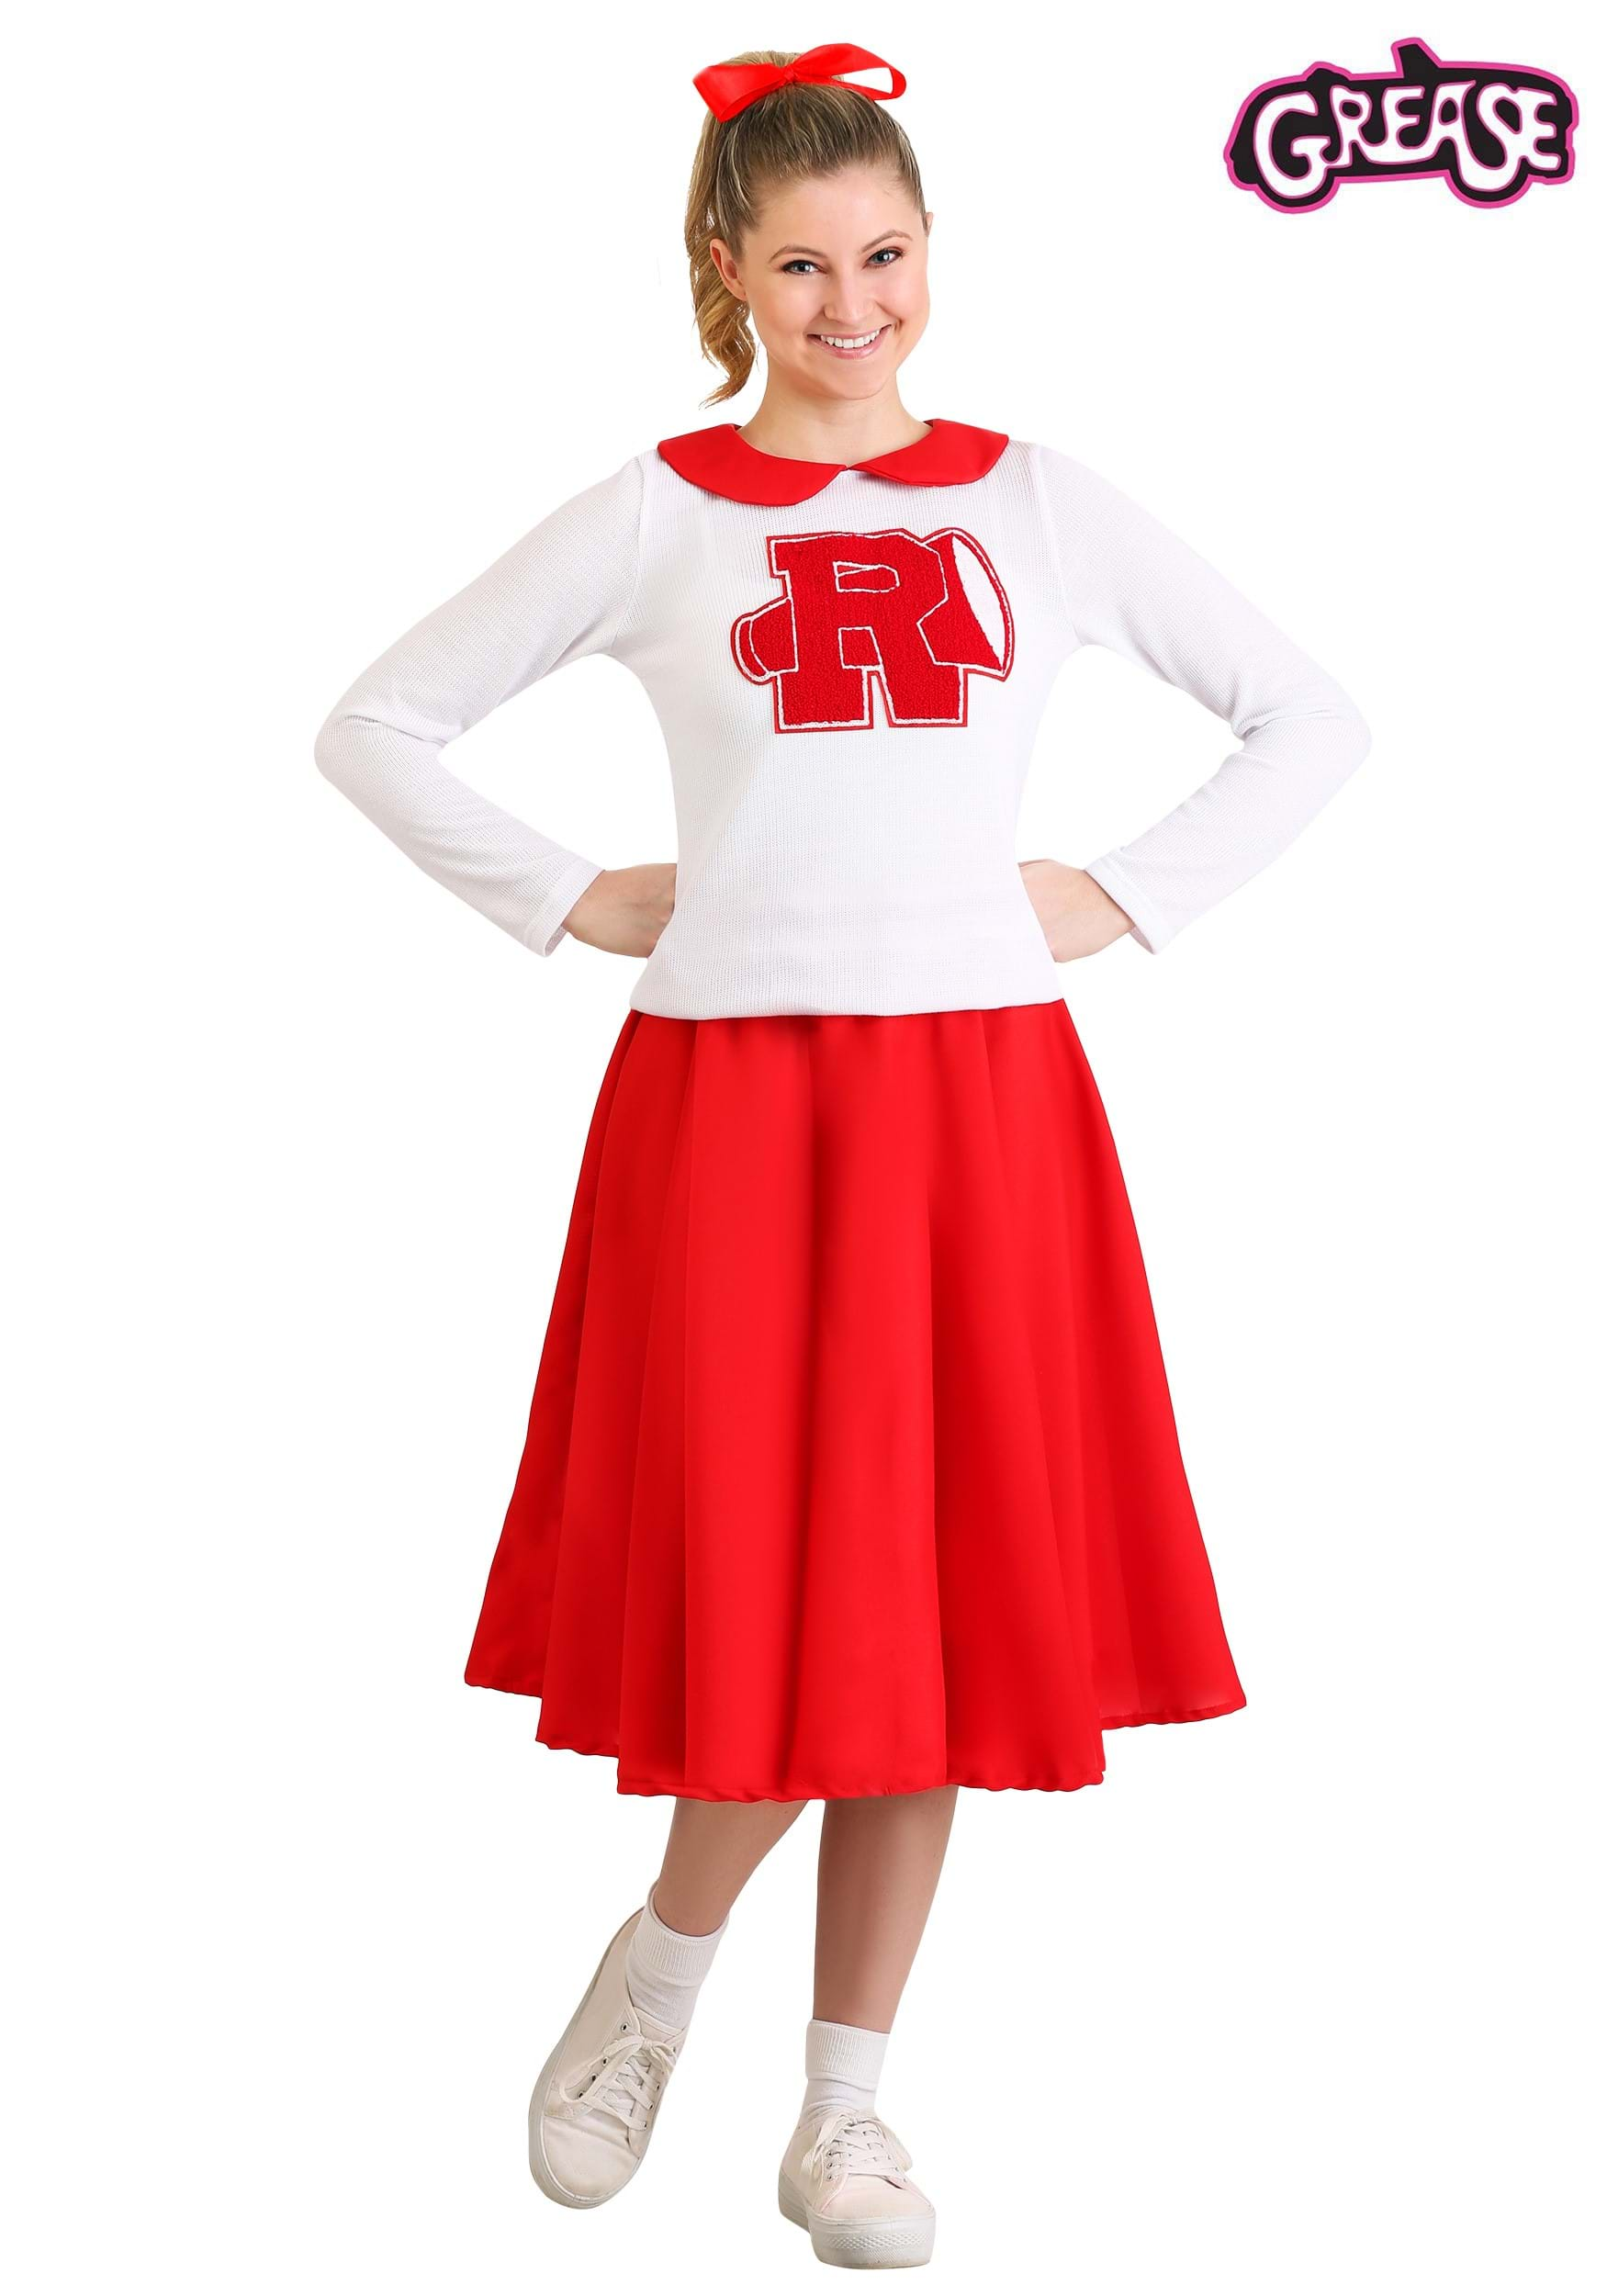 7fb4df58e65 Women s Grease Rydell High Cheerleader Costume Update Main2